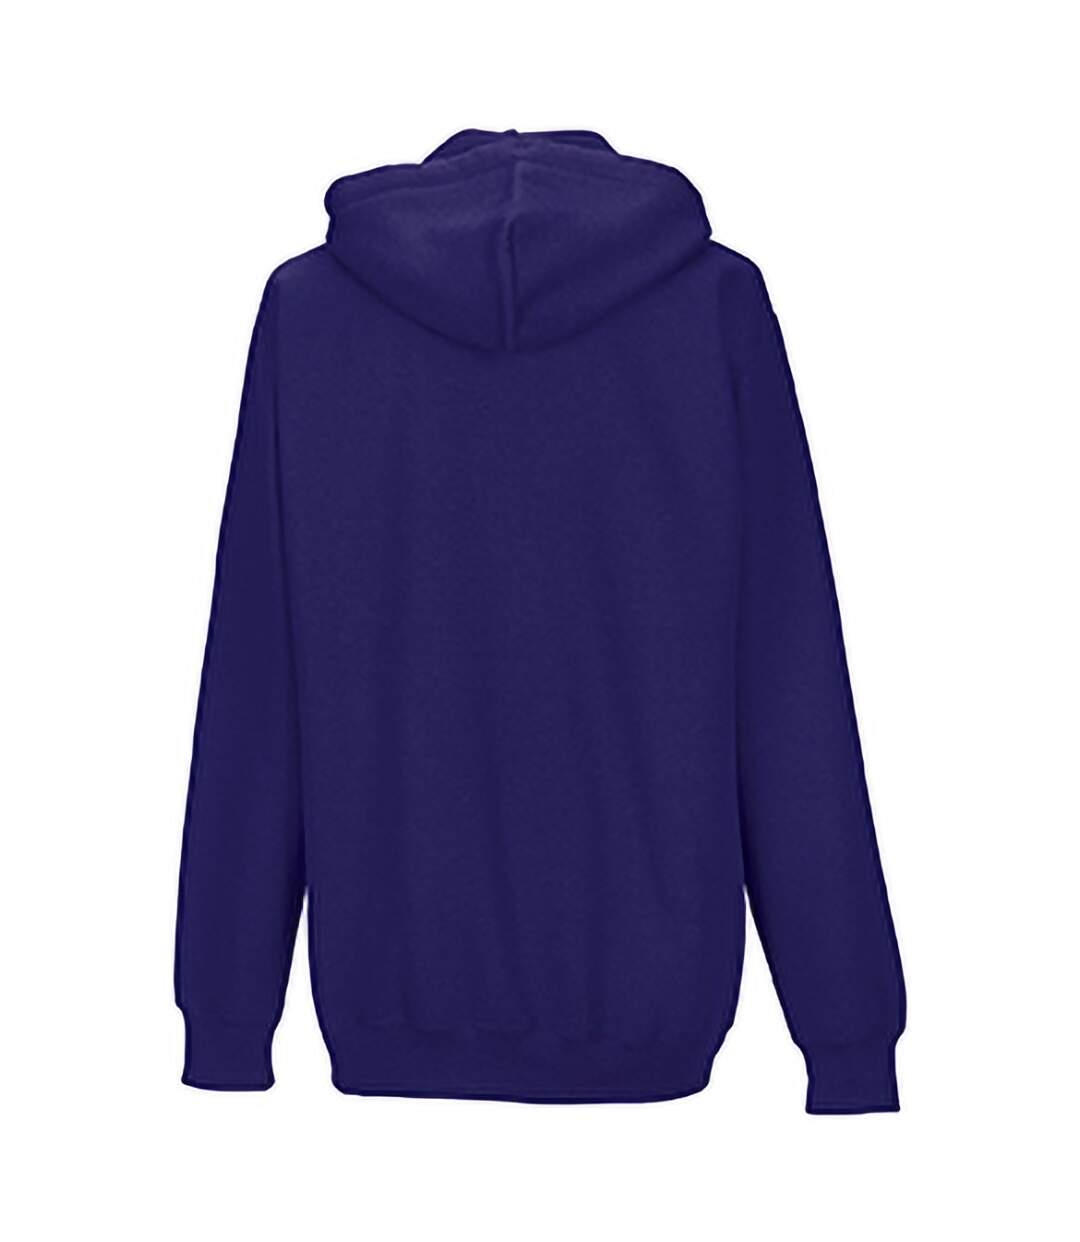 Russell Colour Mens Hooded Sweatshirt / Hoodie (Yellow) - UTBC568